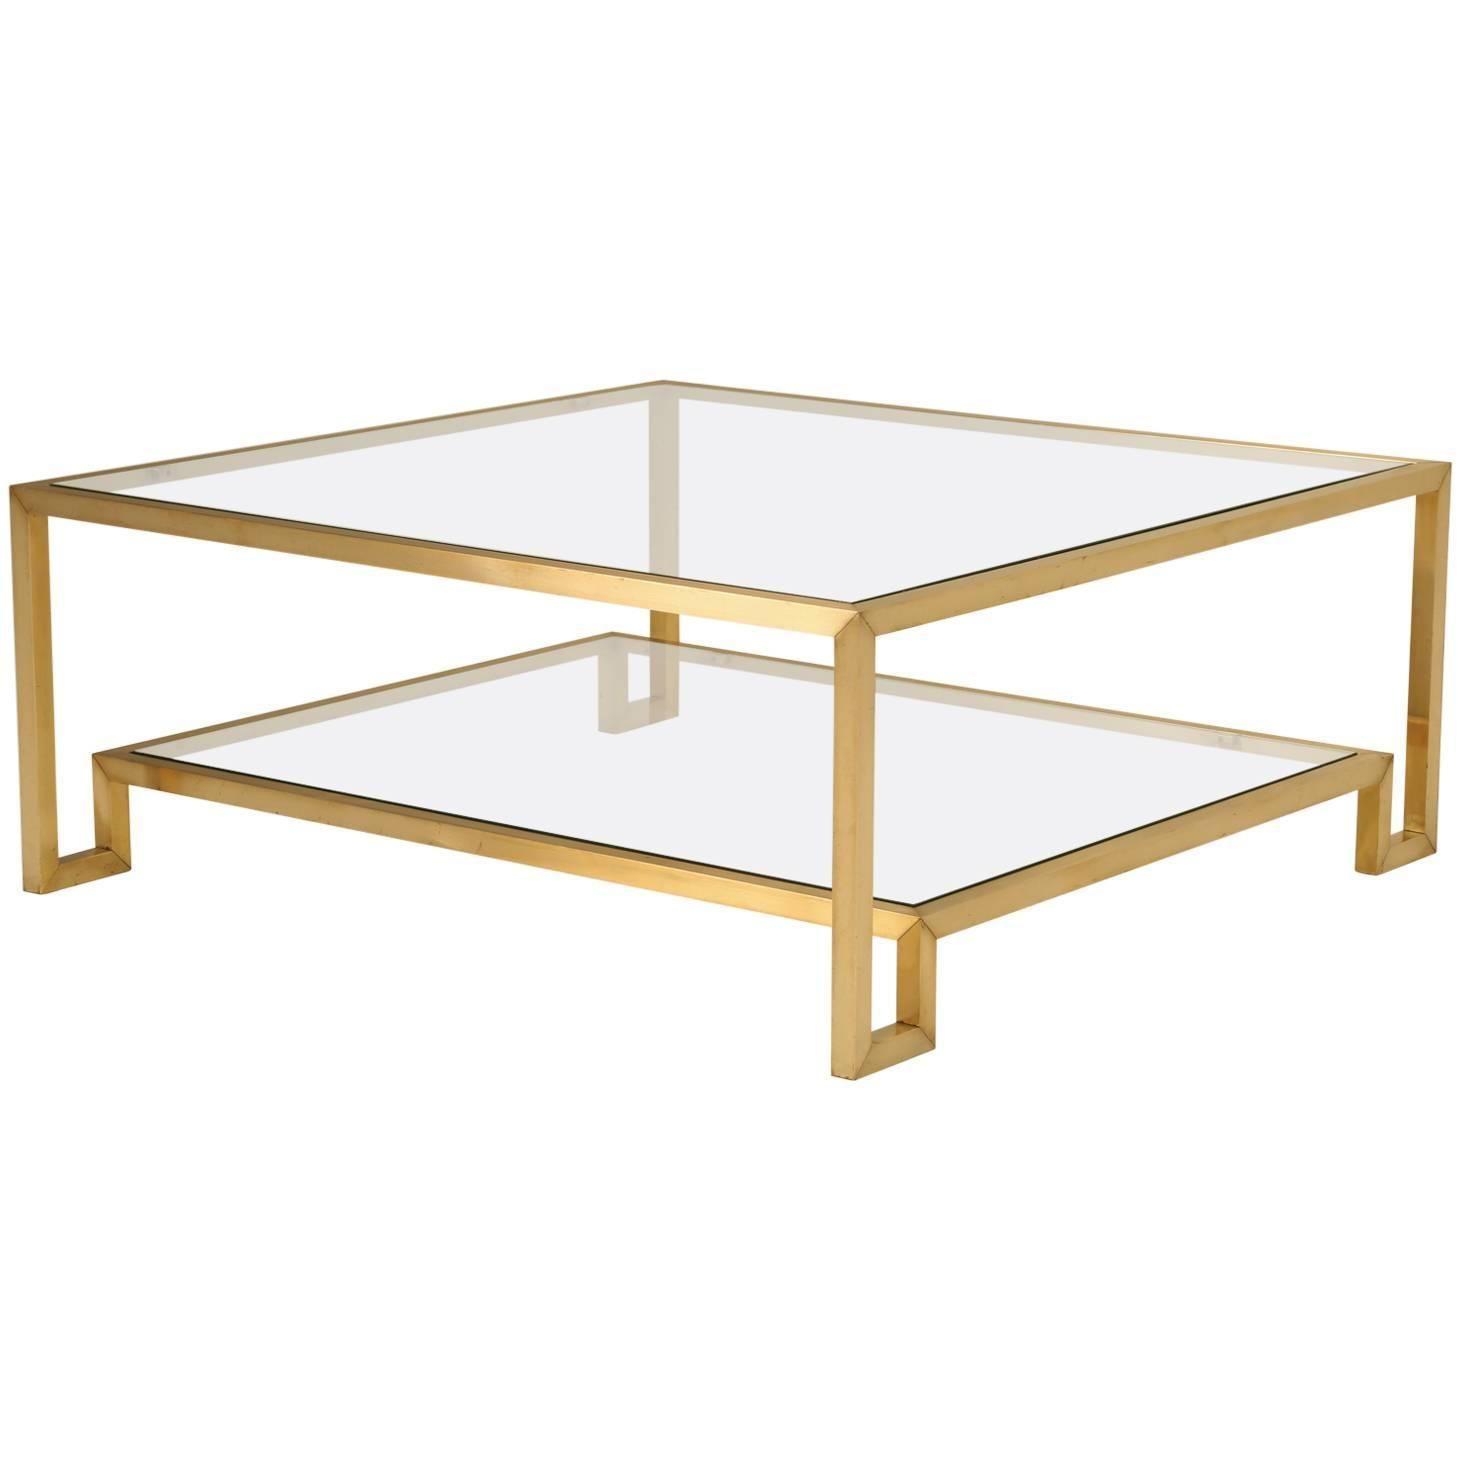 Guy Lefevre Design For Maison Jansen Coffee Table Coffee Table